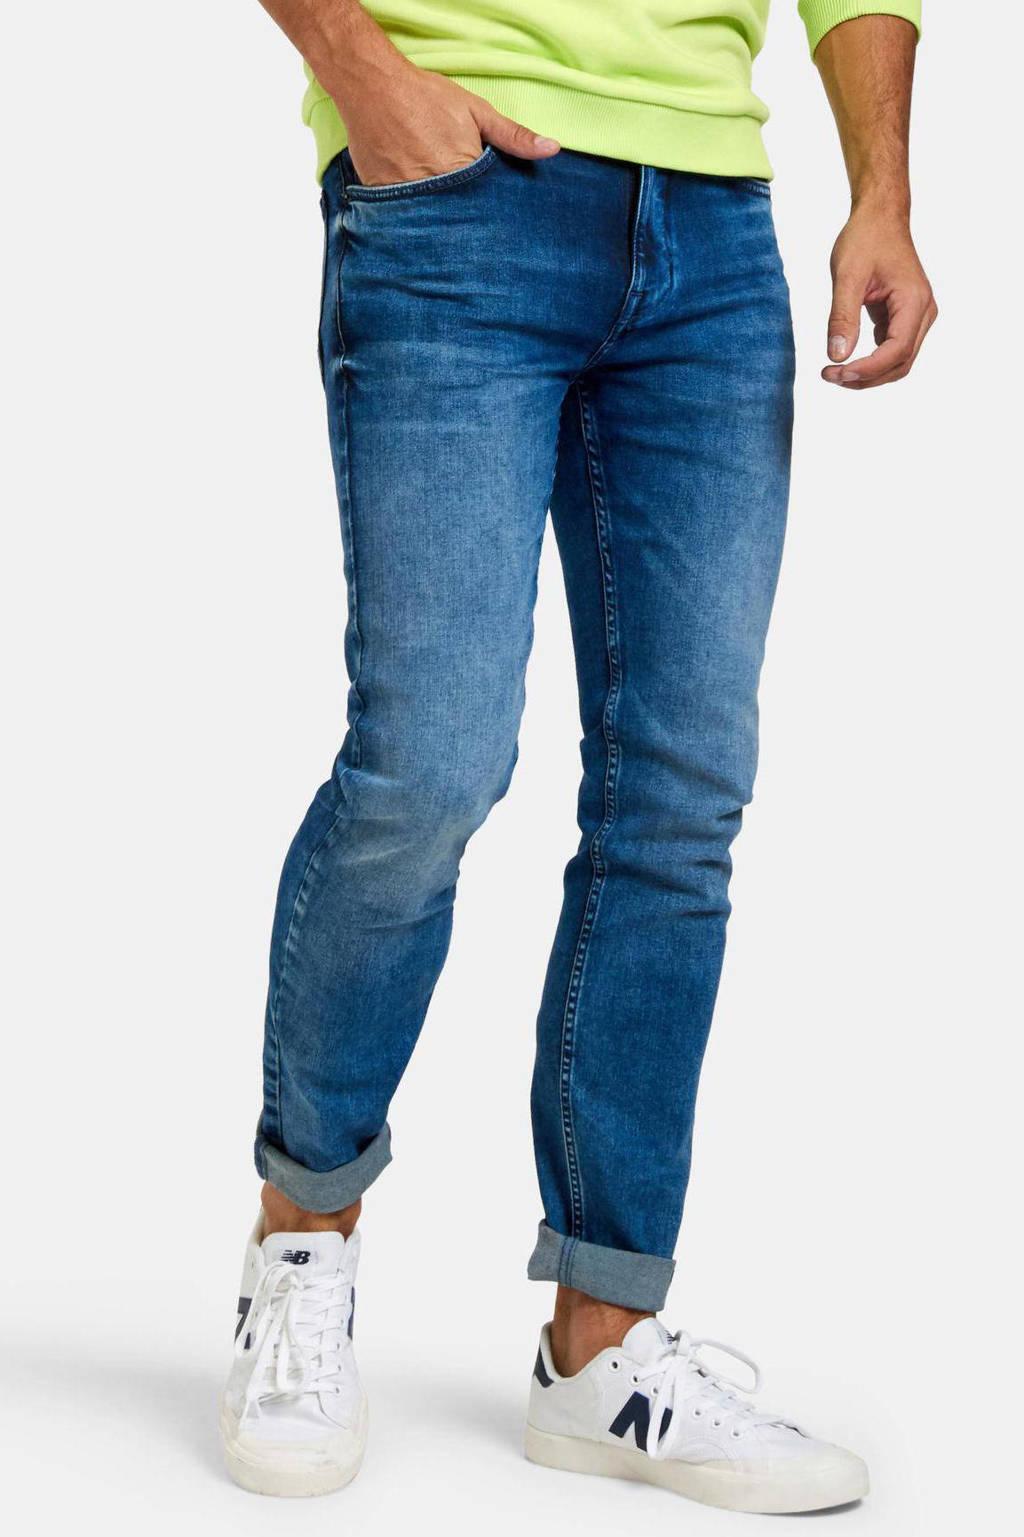 Refill by Shoeby slim fit jeans Lucas Jack mediumstone, MEDIUMSTONE